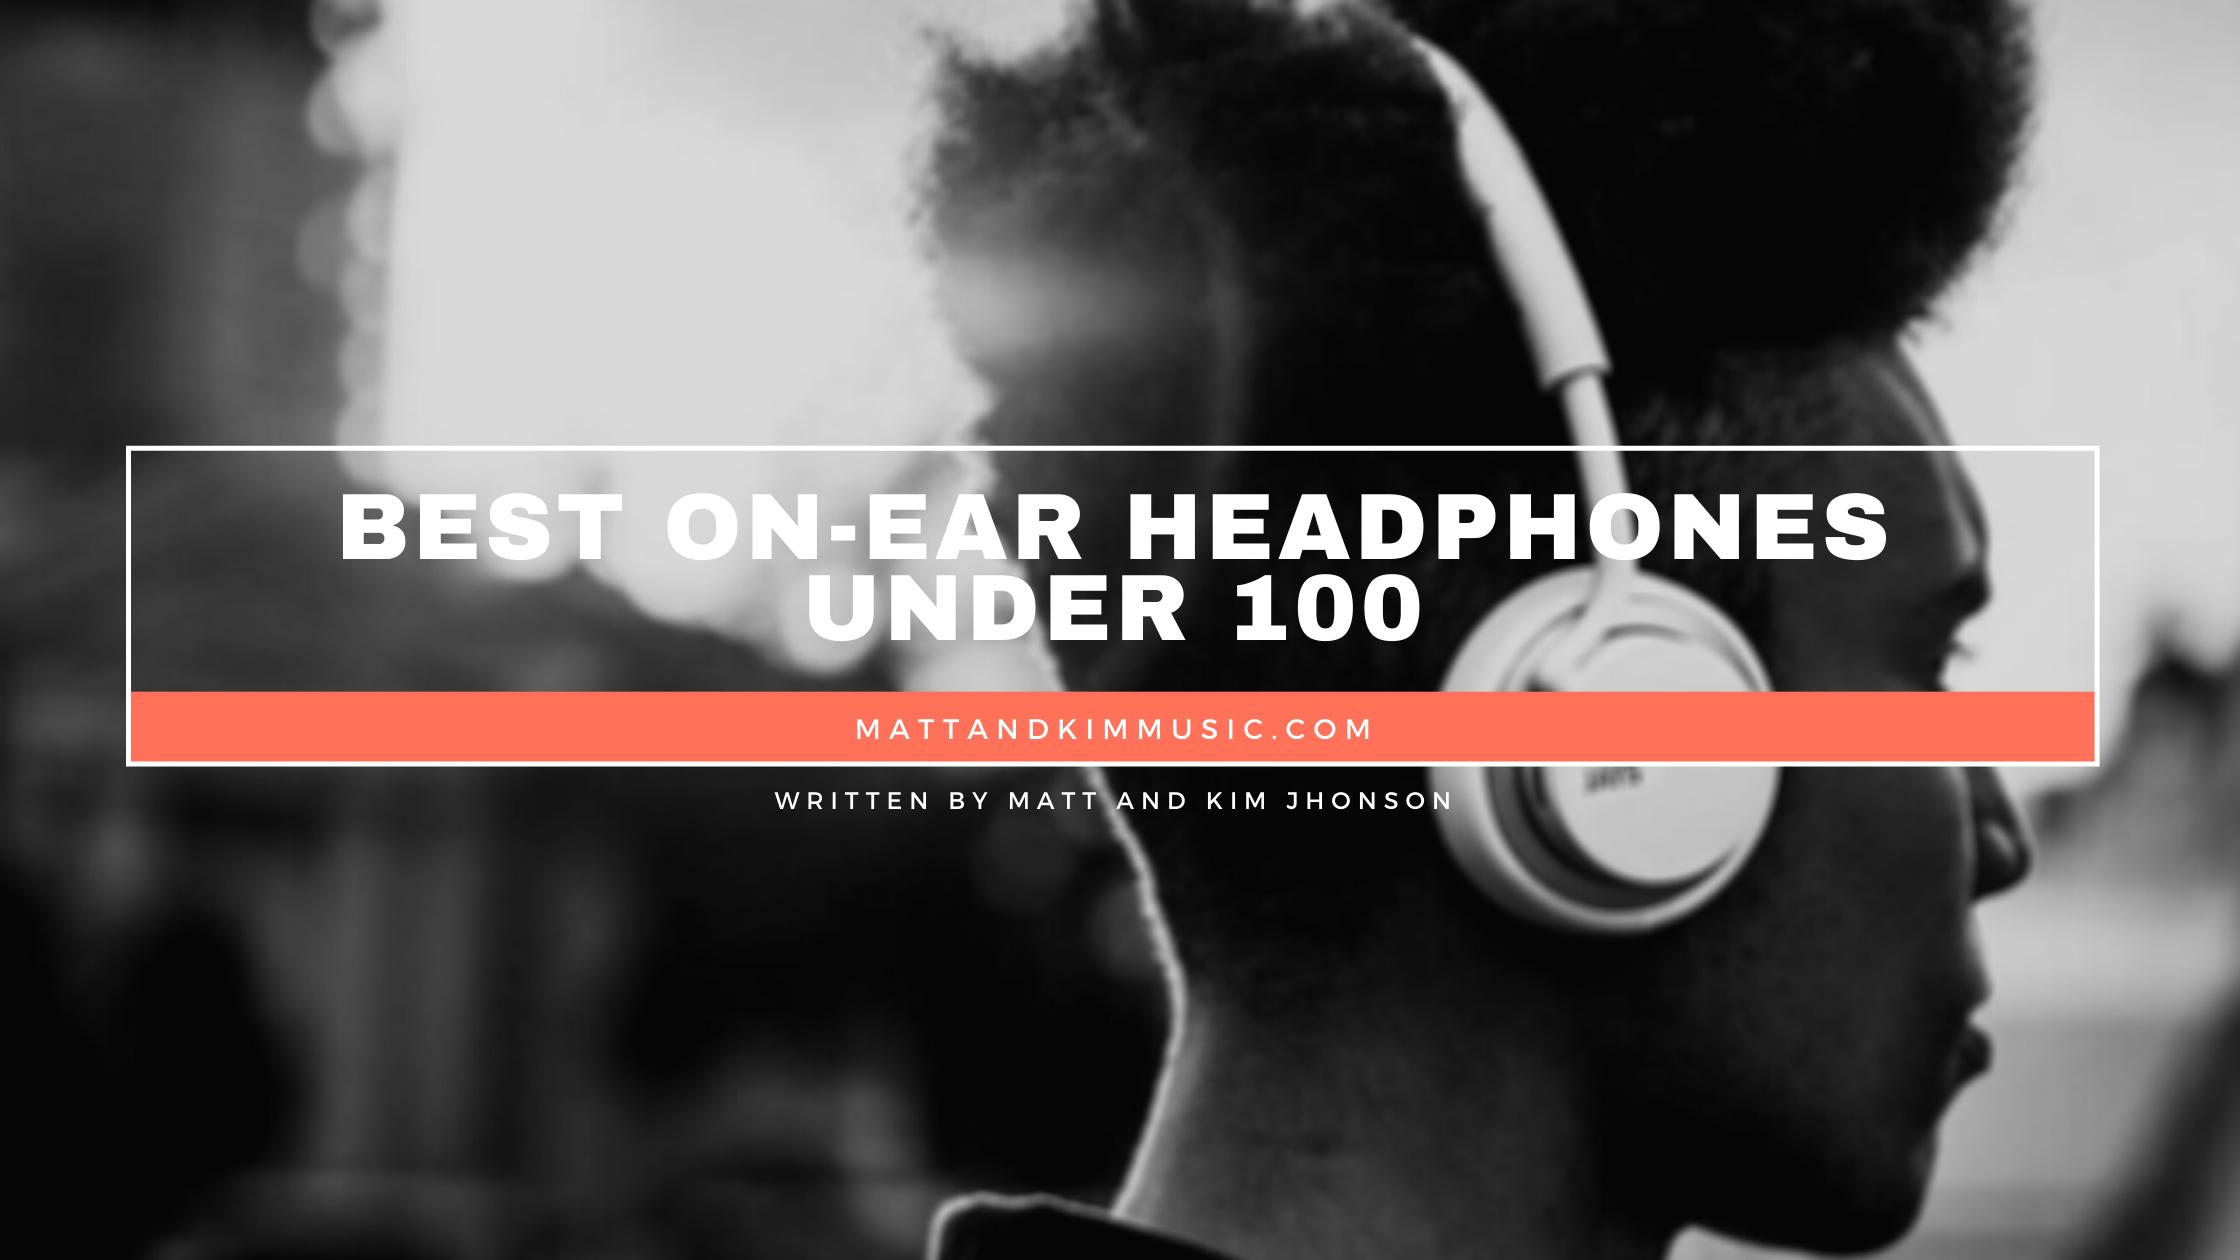 best on-ear headphones under 100